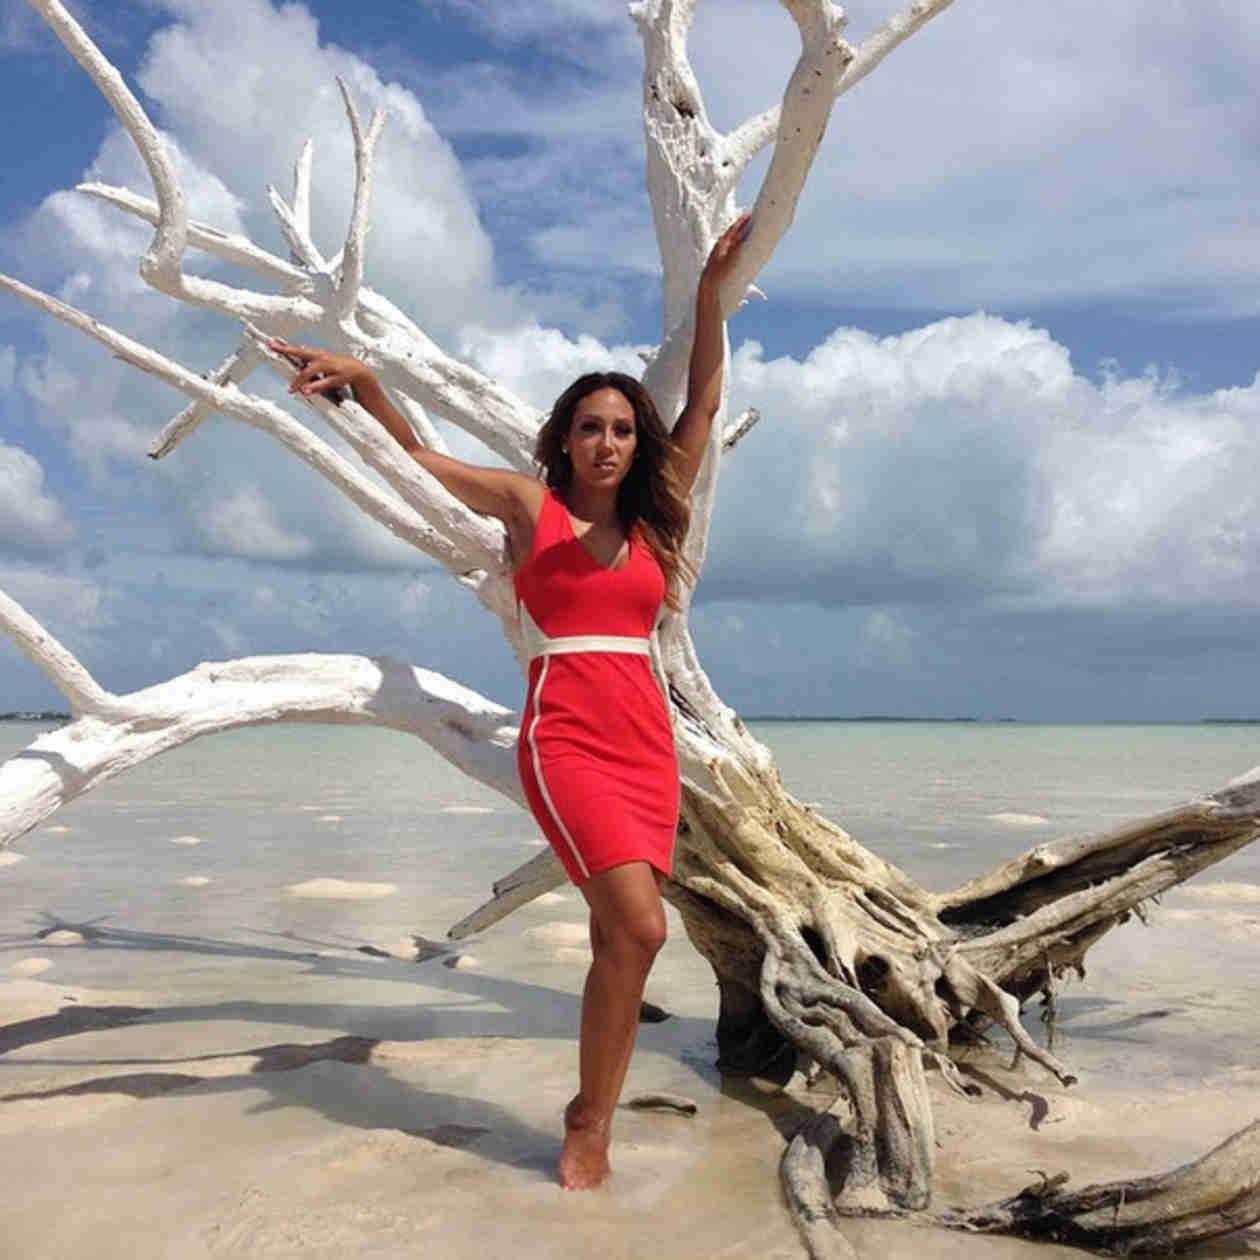 Melissa Gorga Shows Off Beach Bod in Bahamas Photoshoot (PHOTOS)